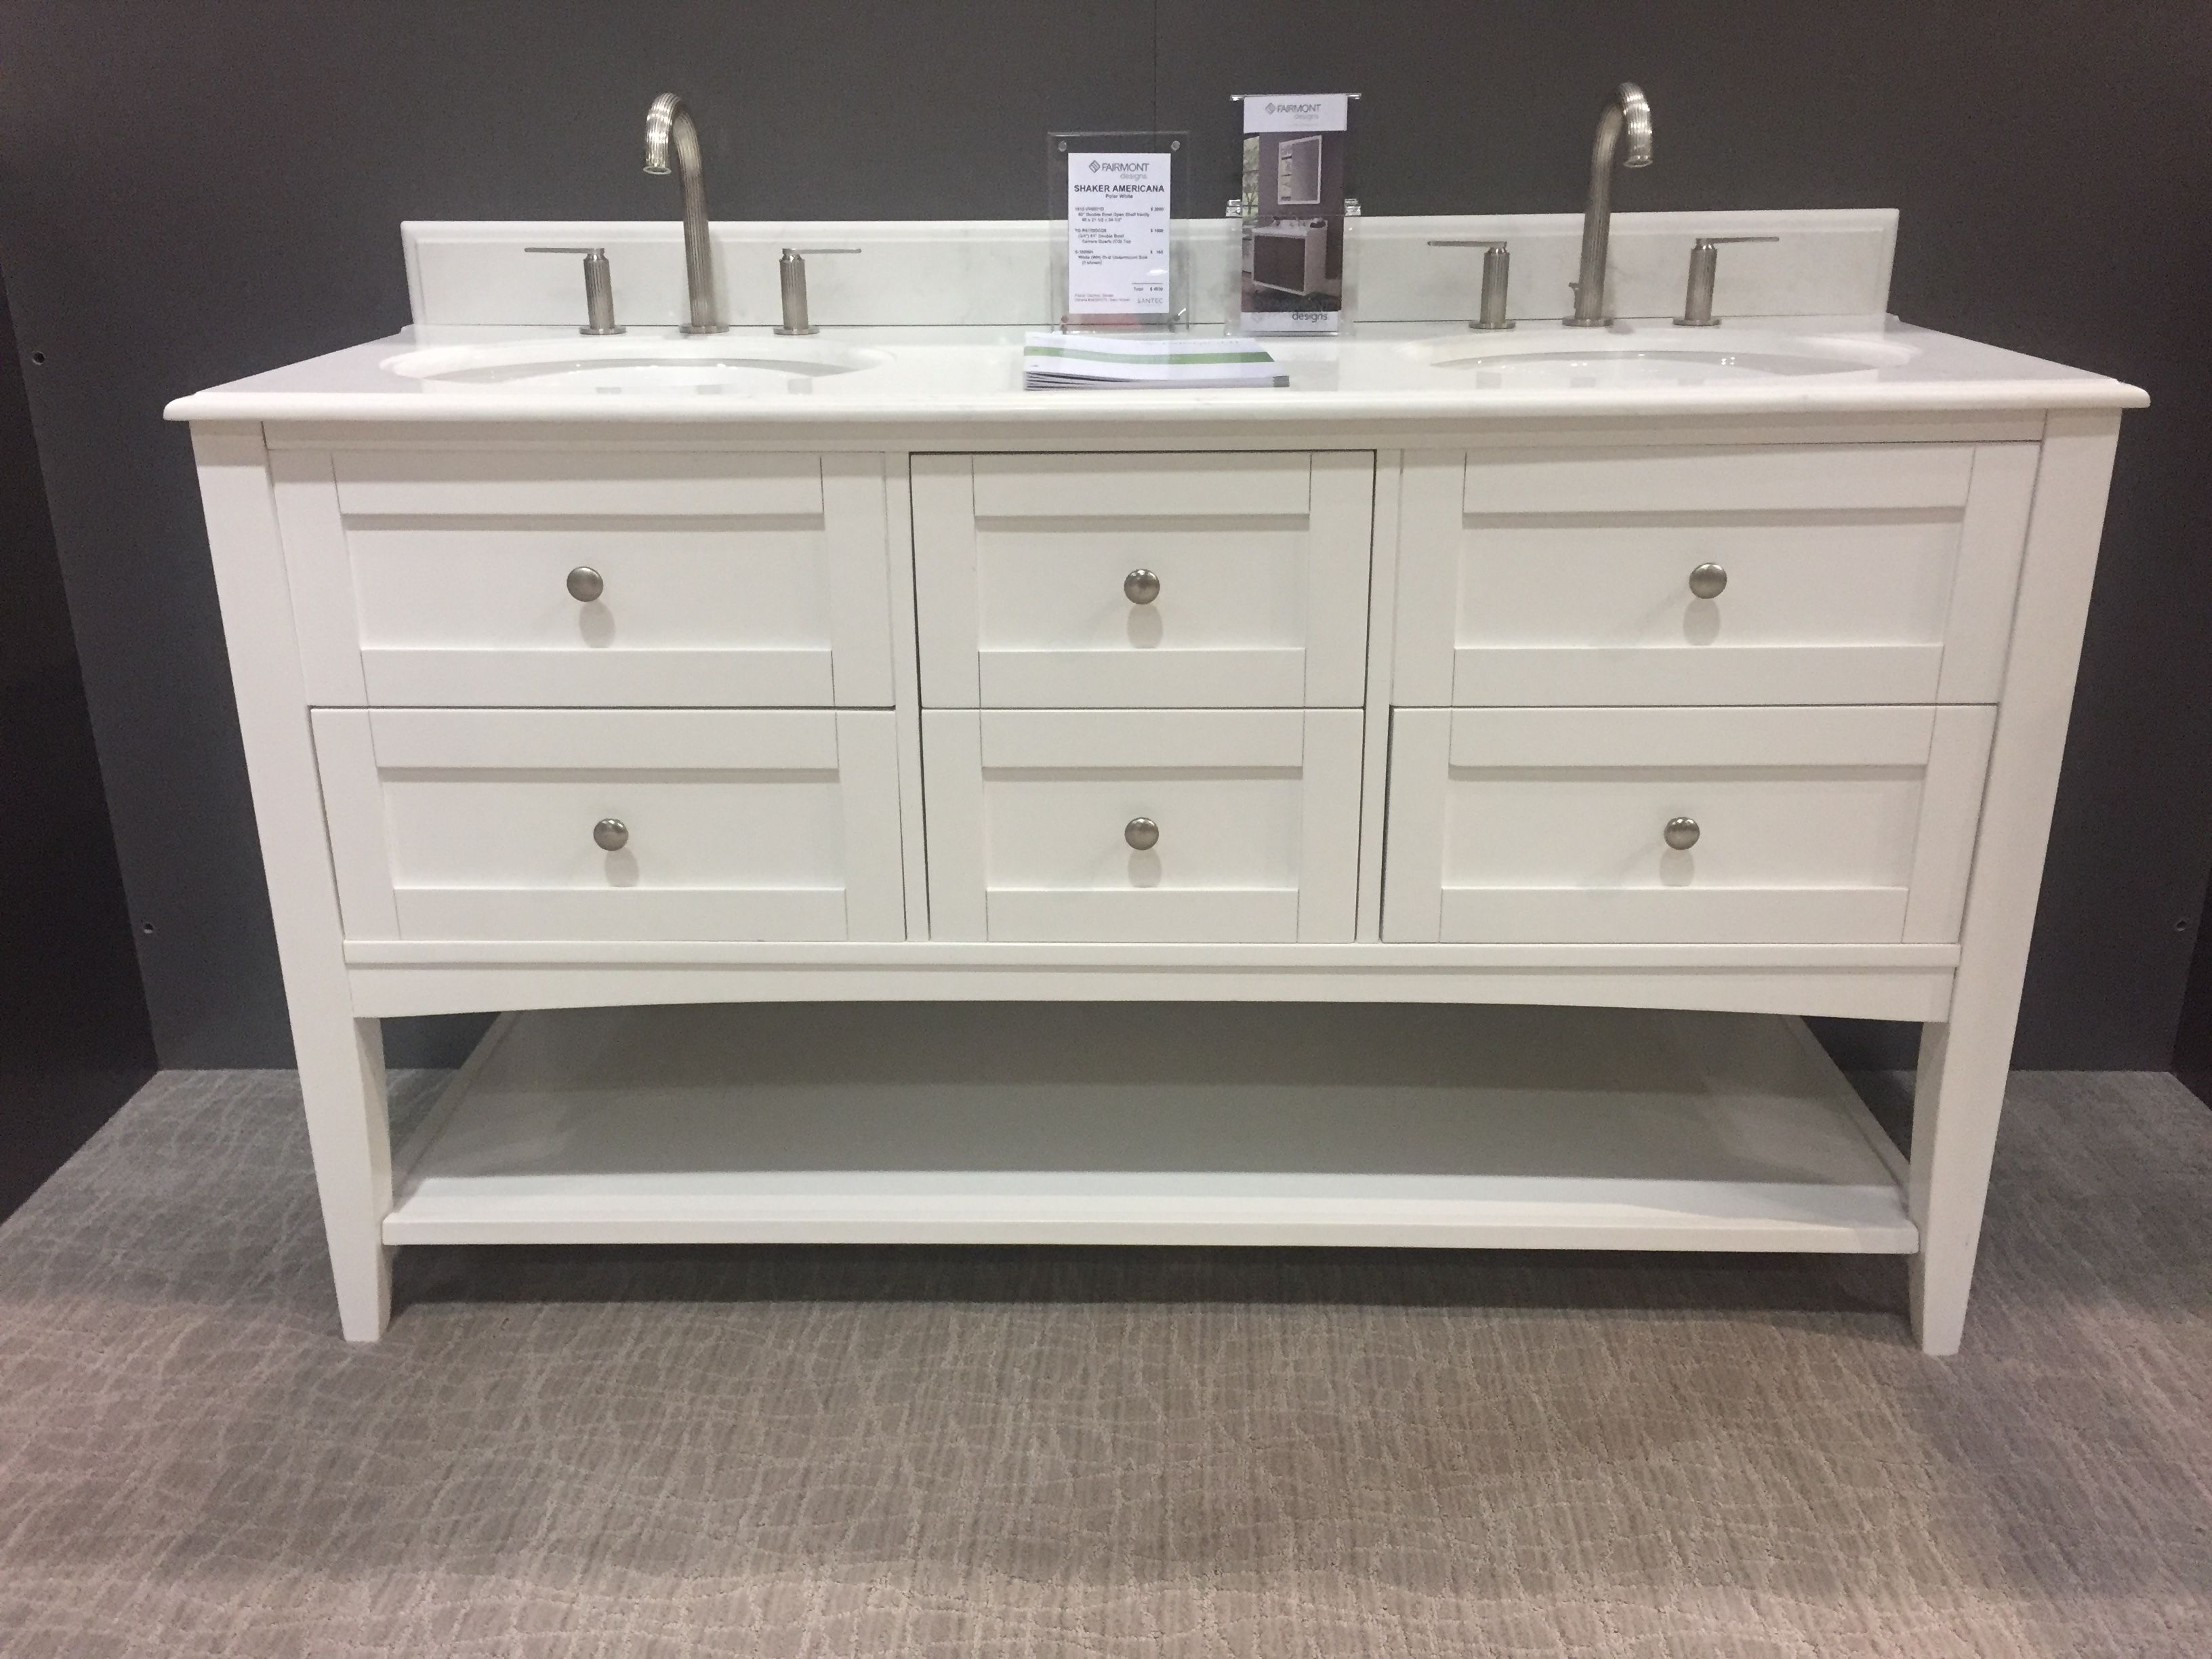 Pin by Fairmont Designs on White Bath Vanities | Bath ...